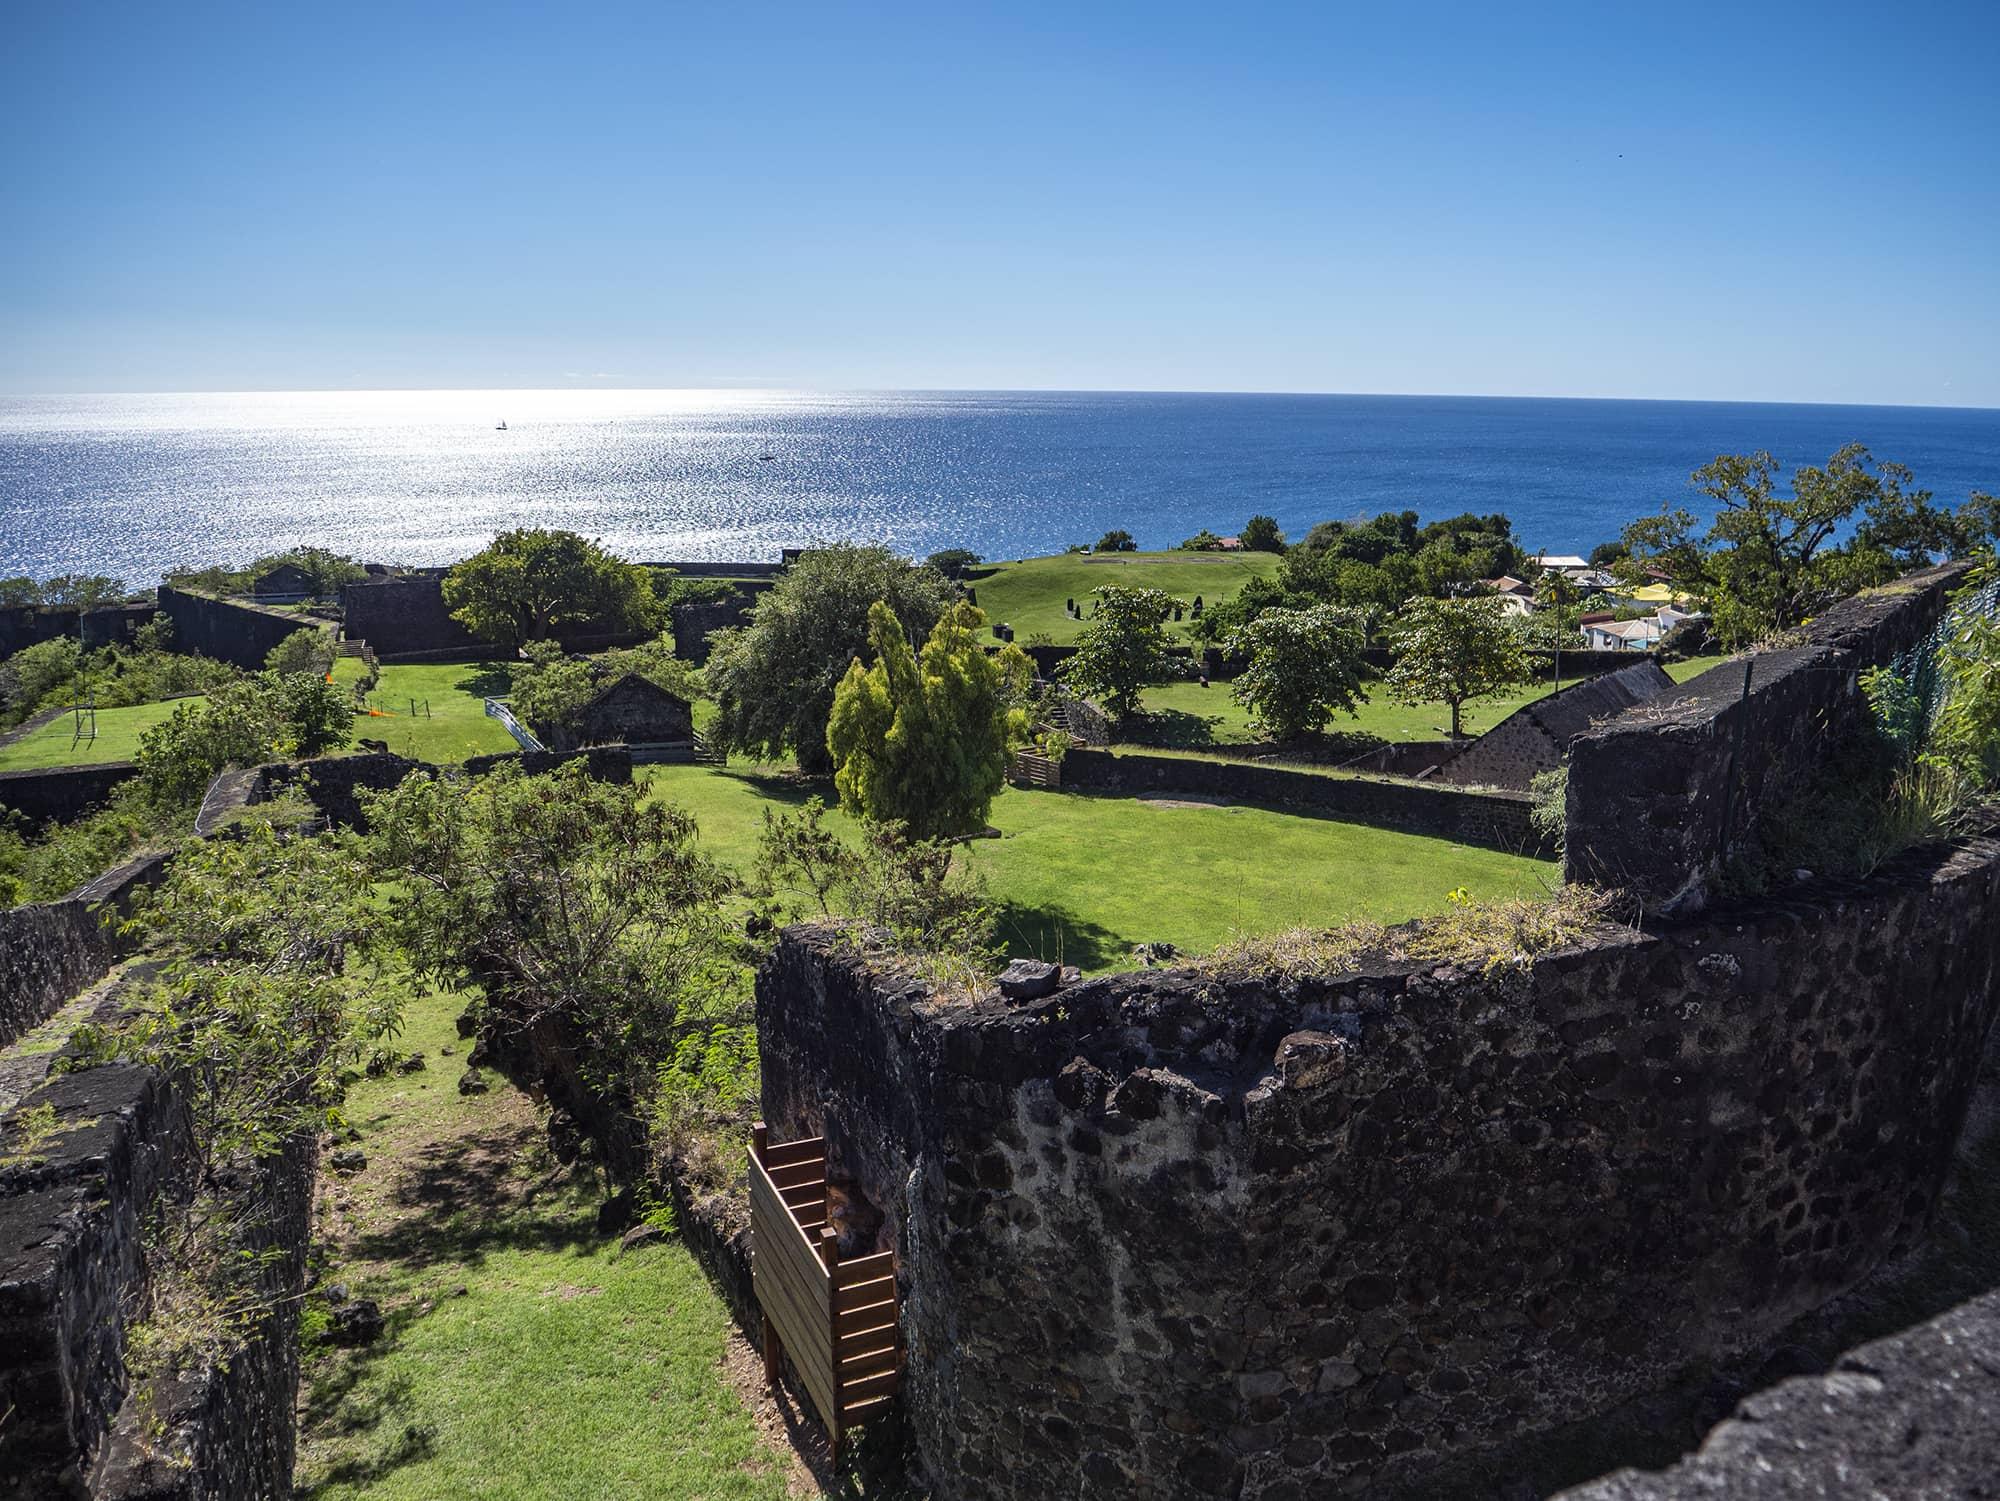 fort-delgres-basse-terre-guadeloupe